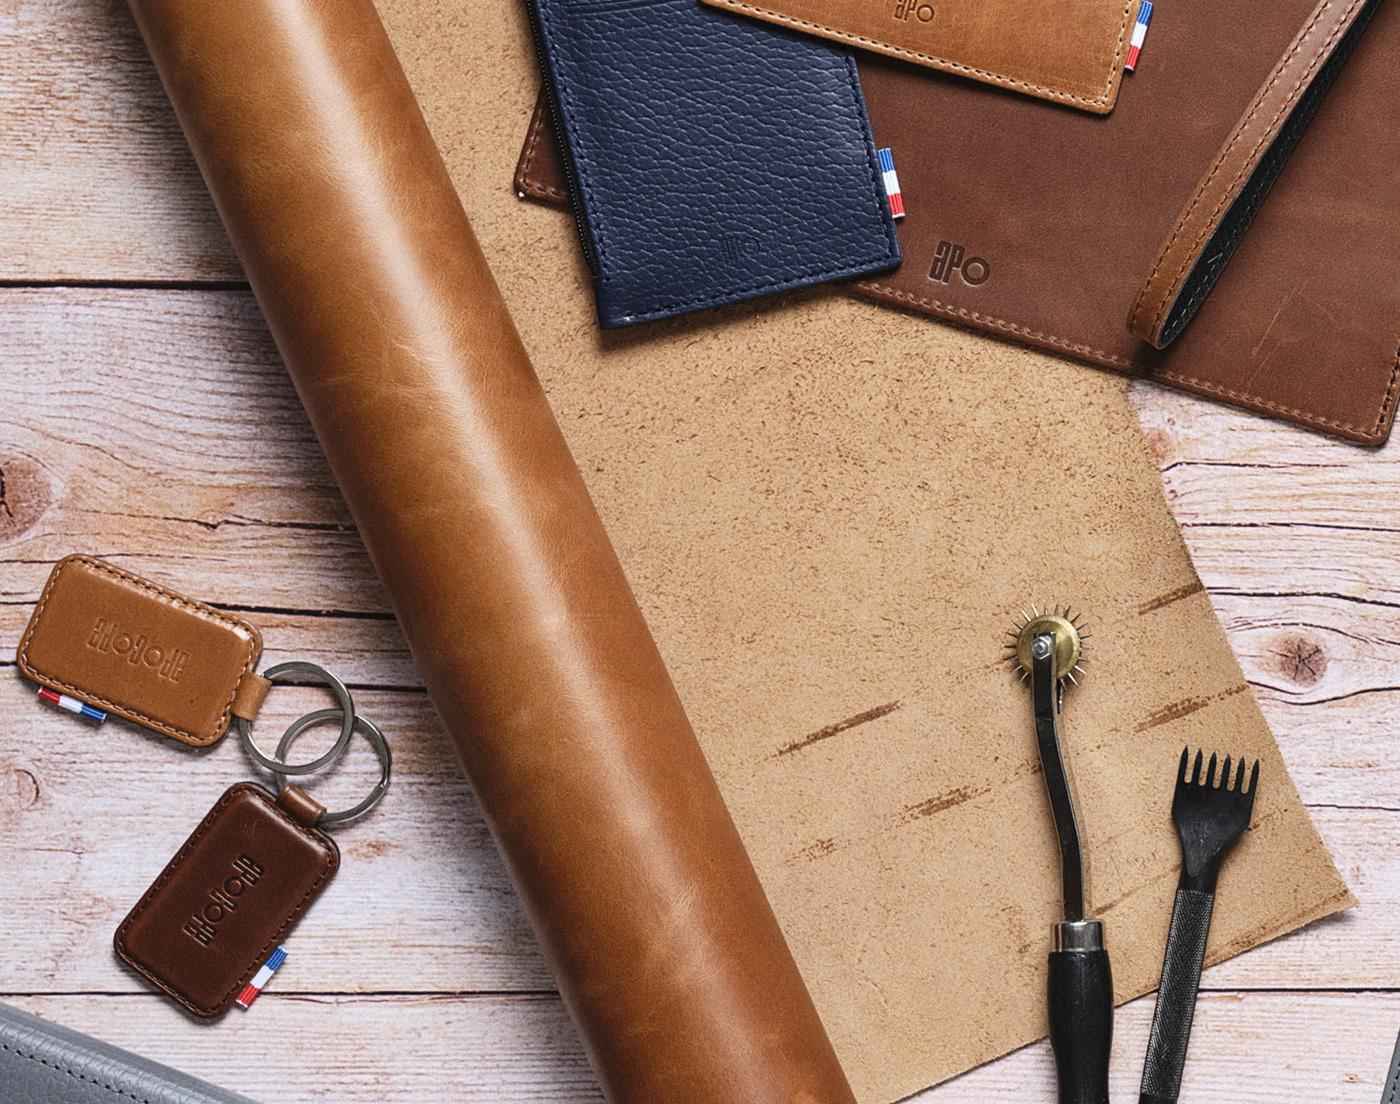 apparel Fashion  leather leather goods Menswear Paris